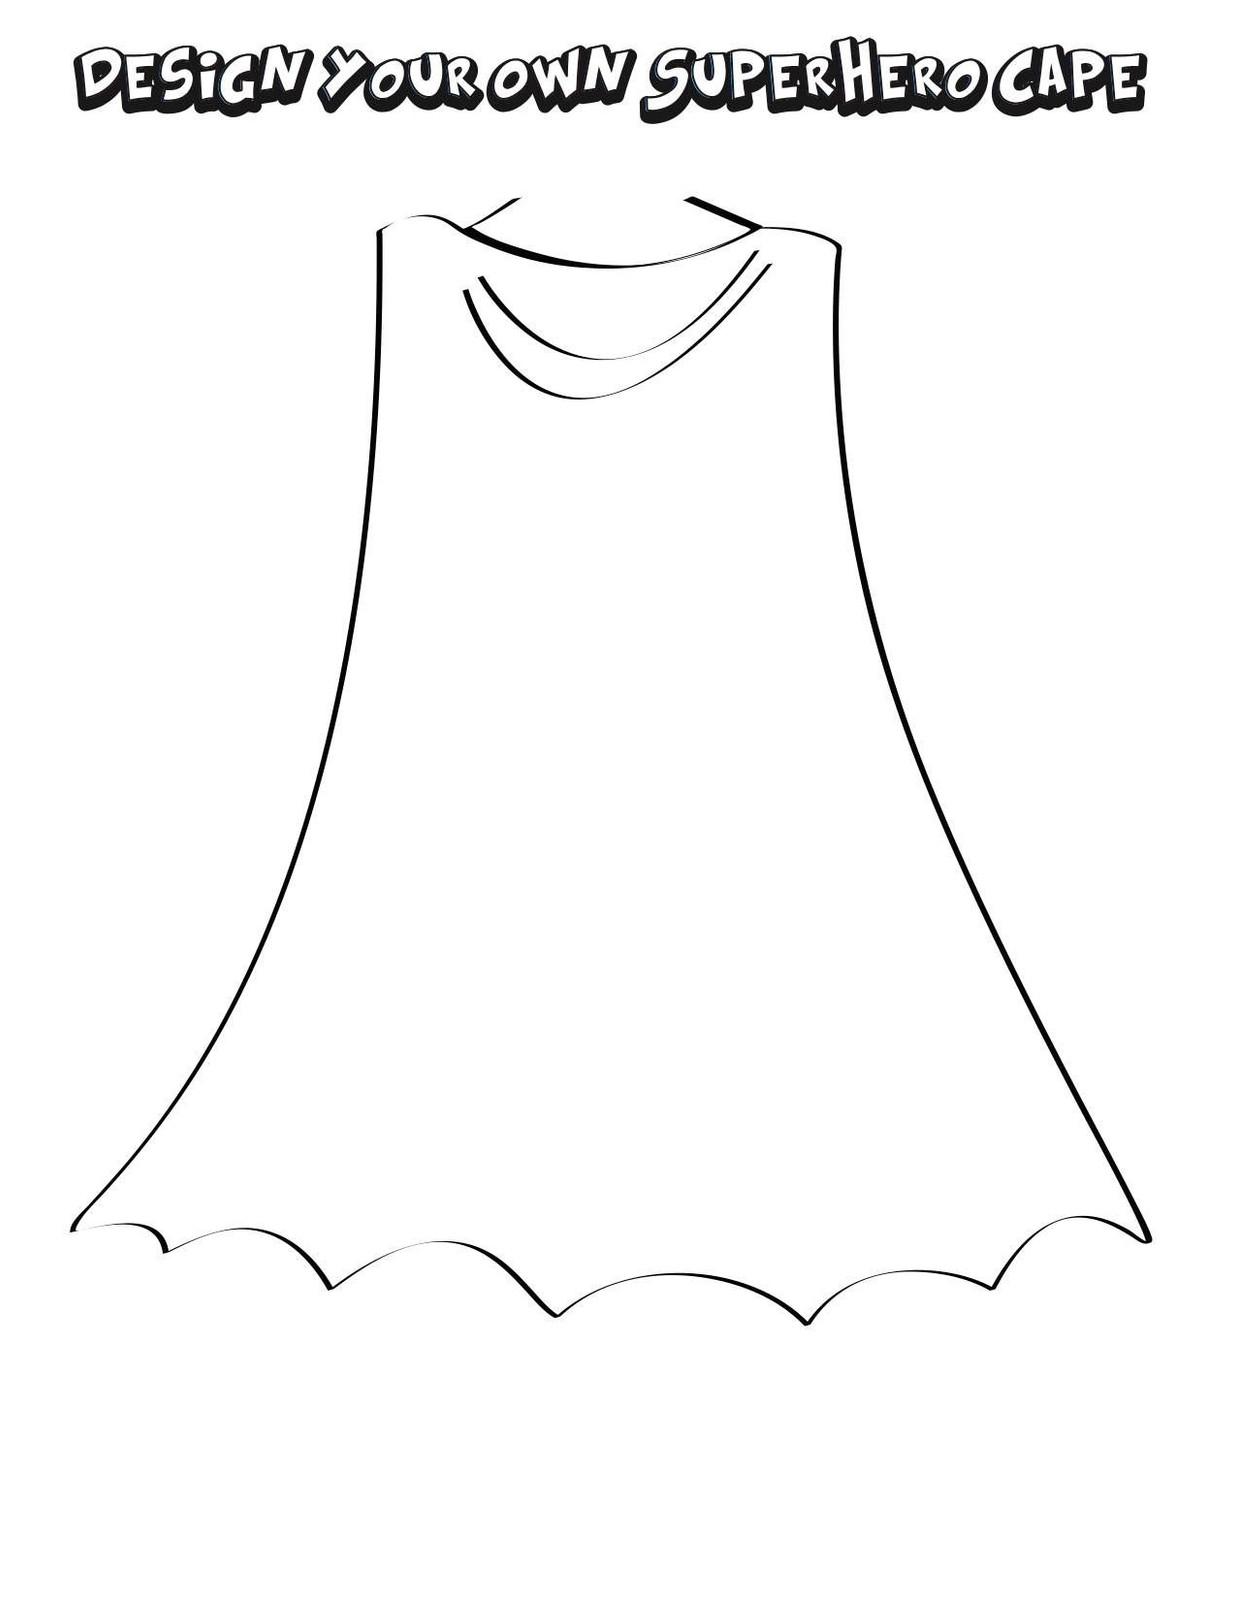 Design your own super hero cape